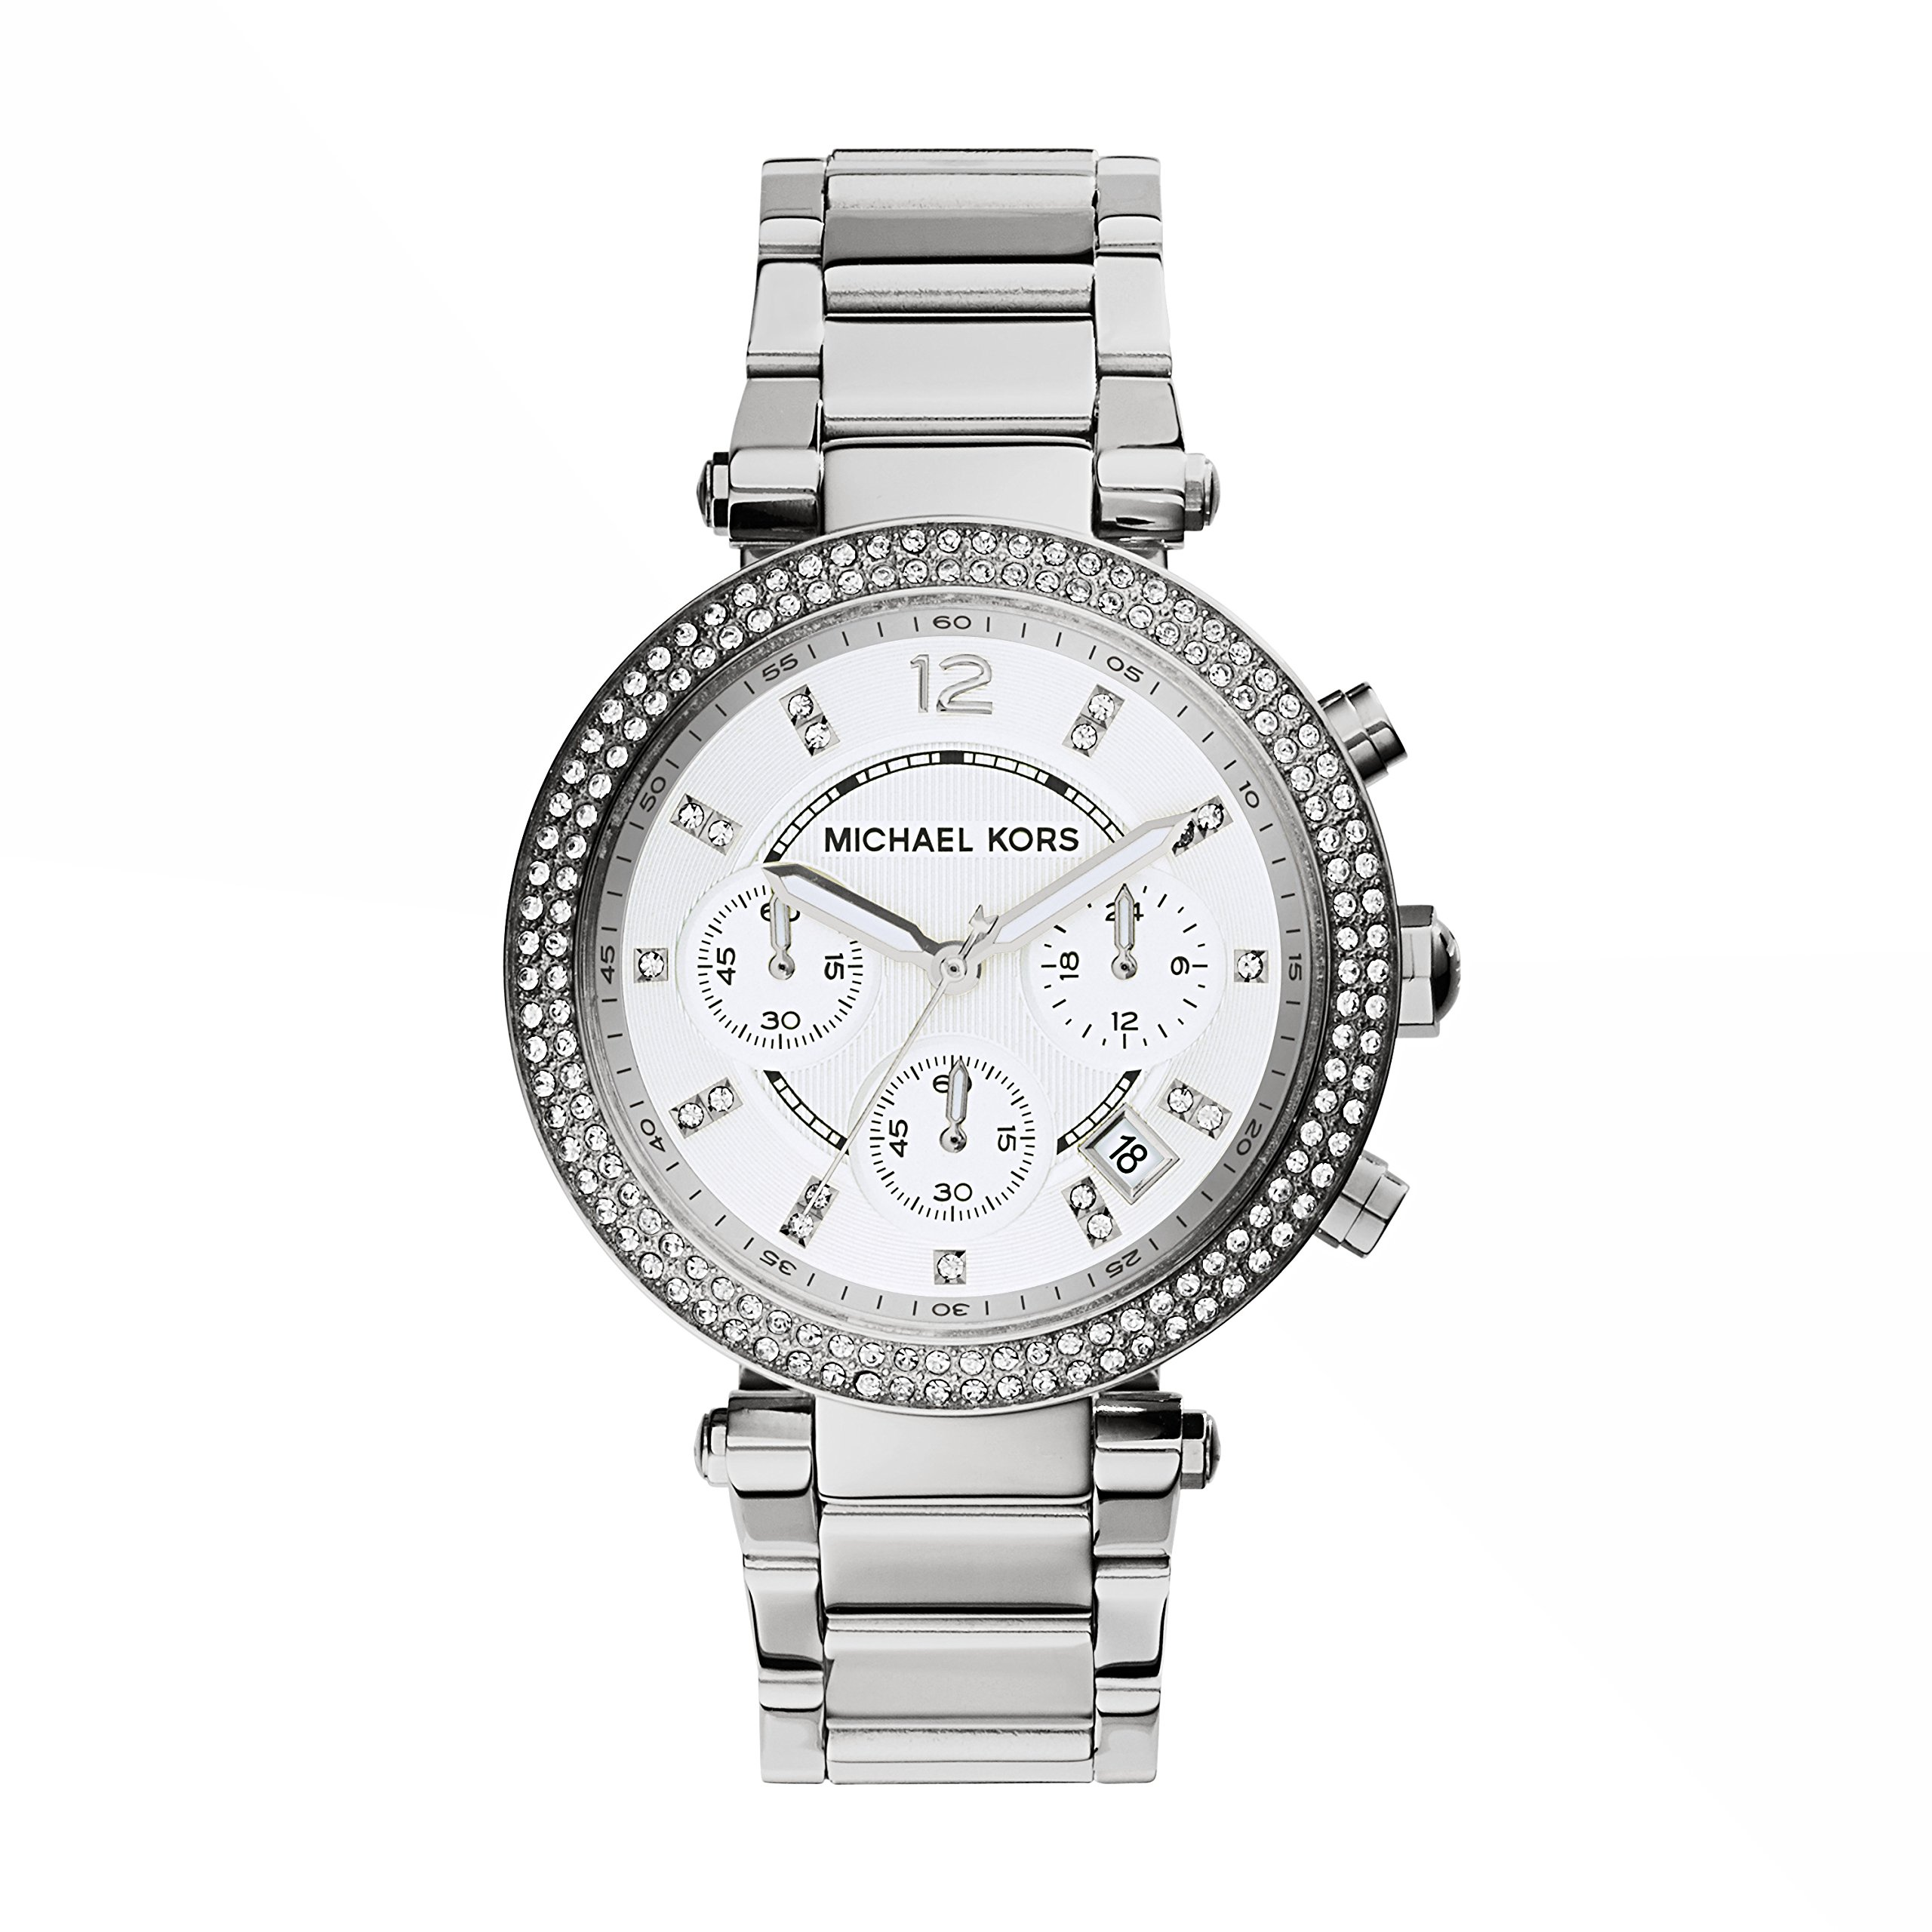 Michael Kors Women's Parker Silver-Tone Watch MK5353 by Michael Kors